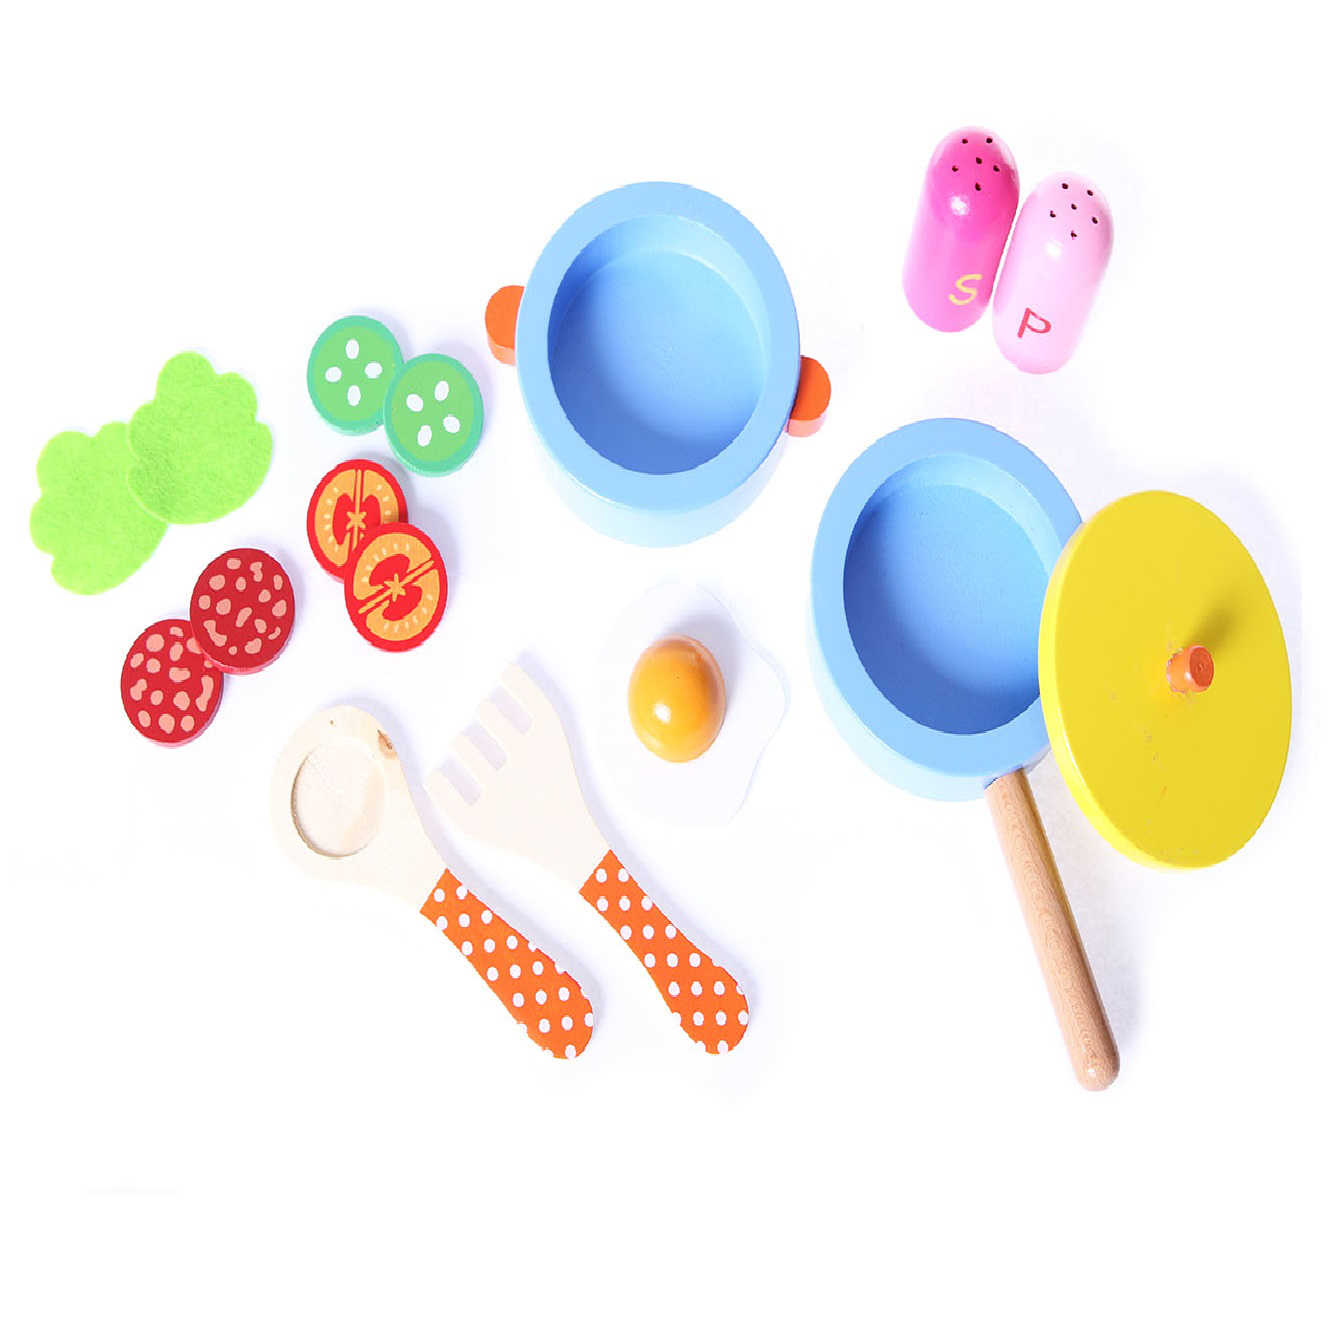 Skład zestawu mini kuchni ECOTOYS HJD931160